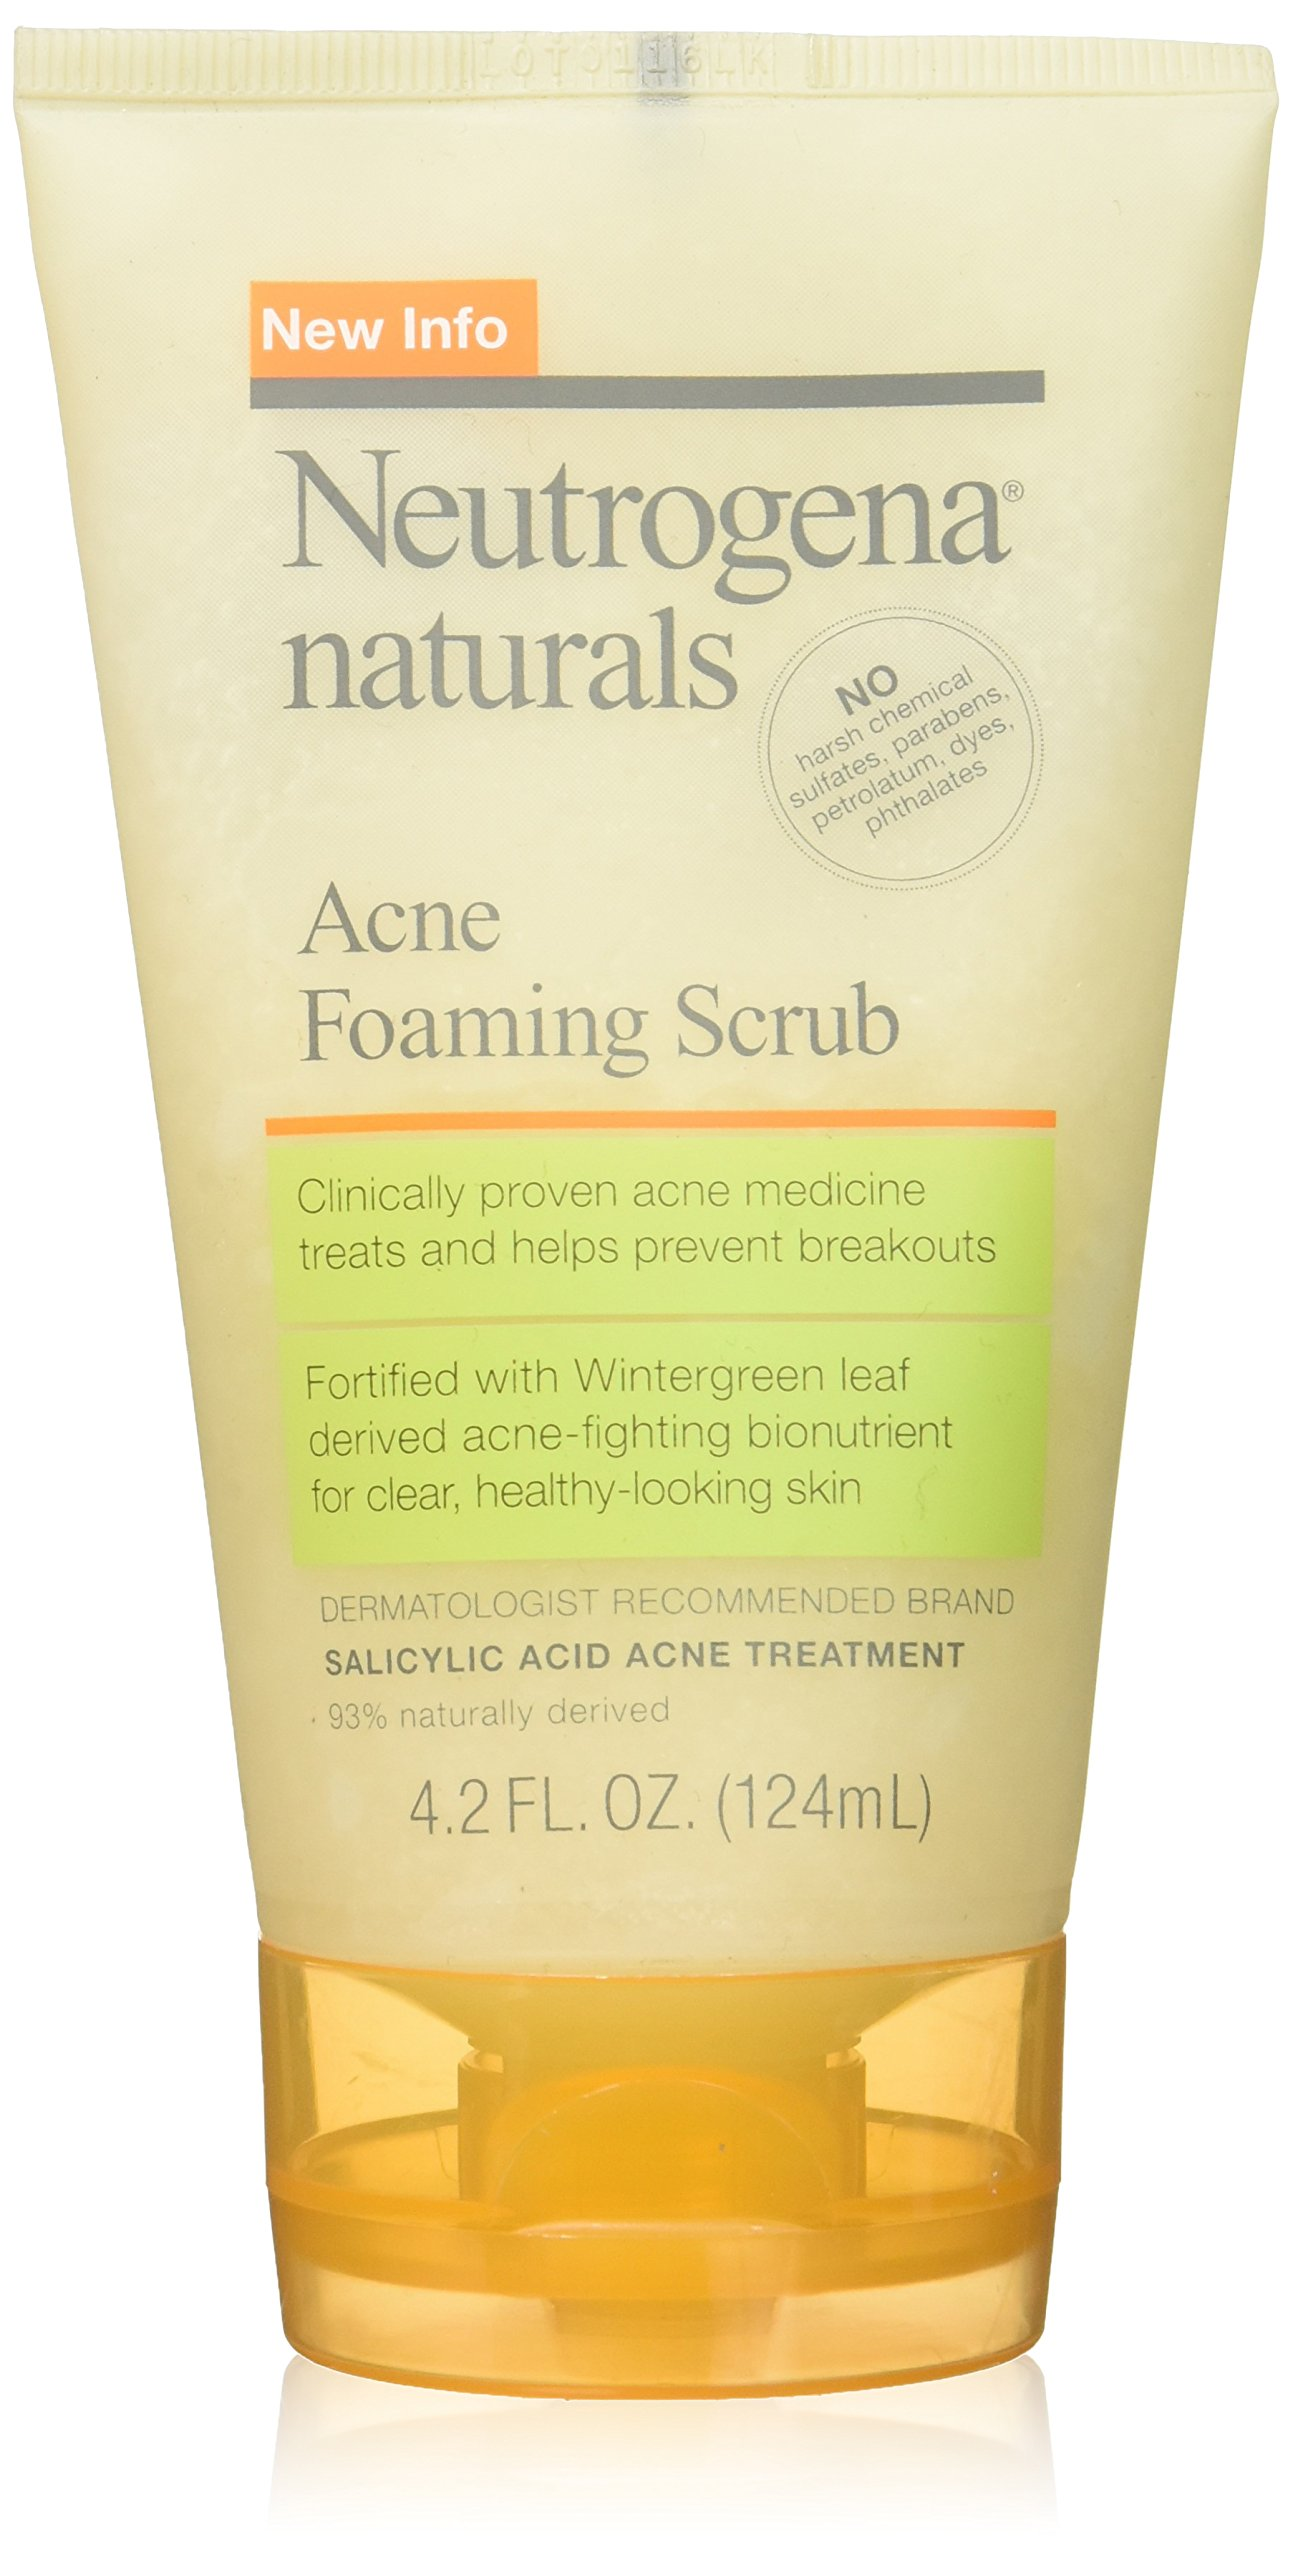 Neutrogena Naturals Acne Foaming Scrub, 4.2 Oz